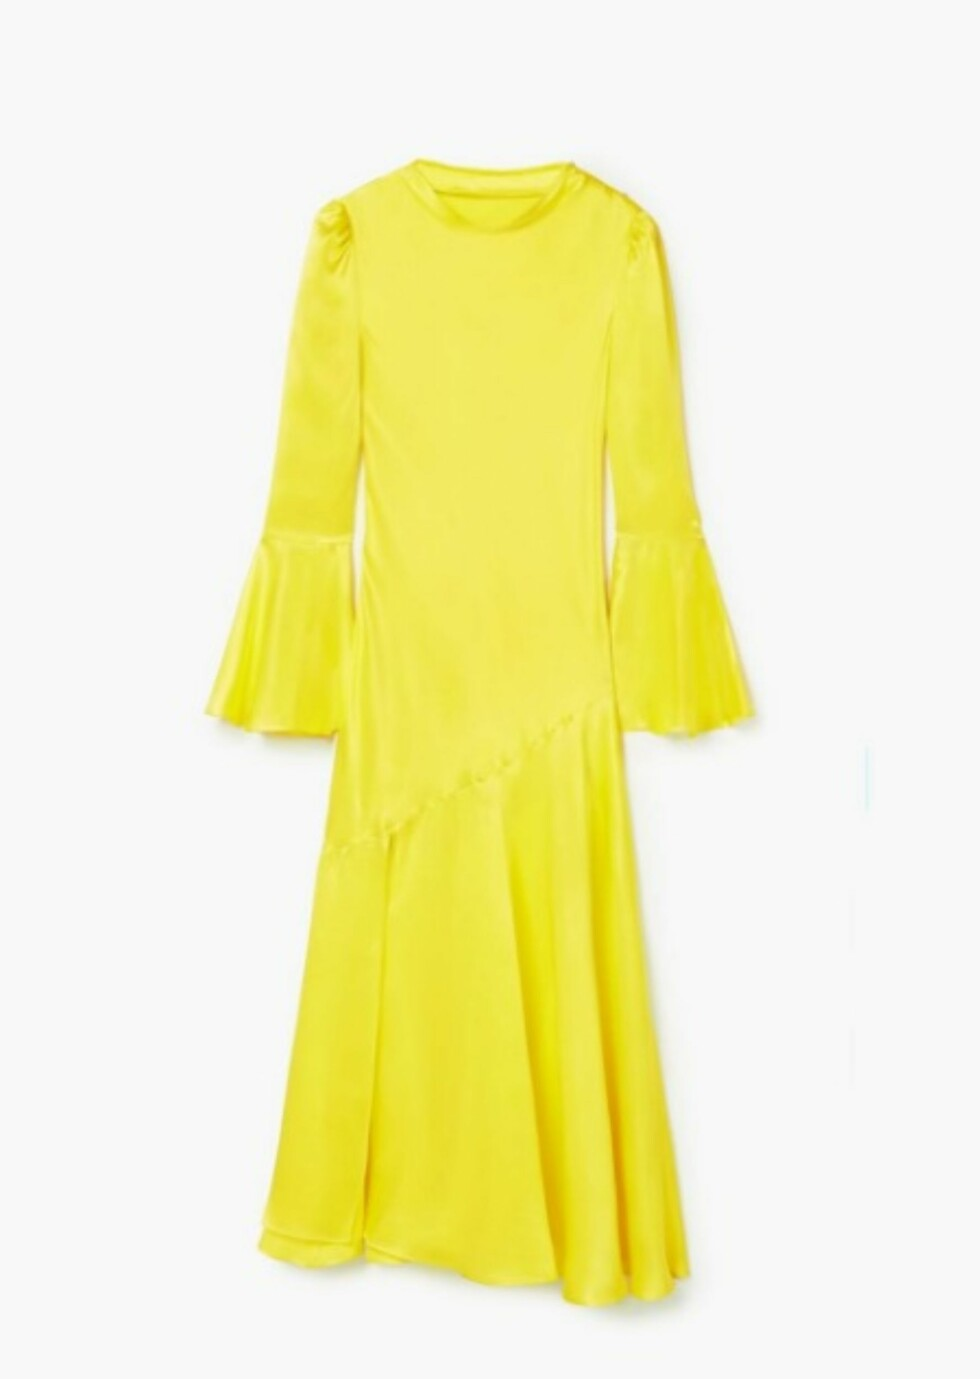 <strong>Kjole fra Mango | kr 1999 | http:</strong>//shop.mango.com/NO-en/p1/woman/clothing/dresses/long/100-silk-dress?id=81075604_12&n=1&s=search&ts=1491291176005